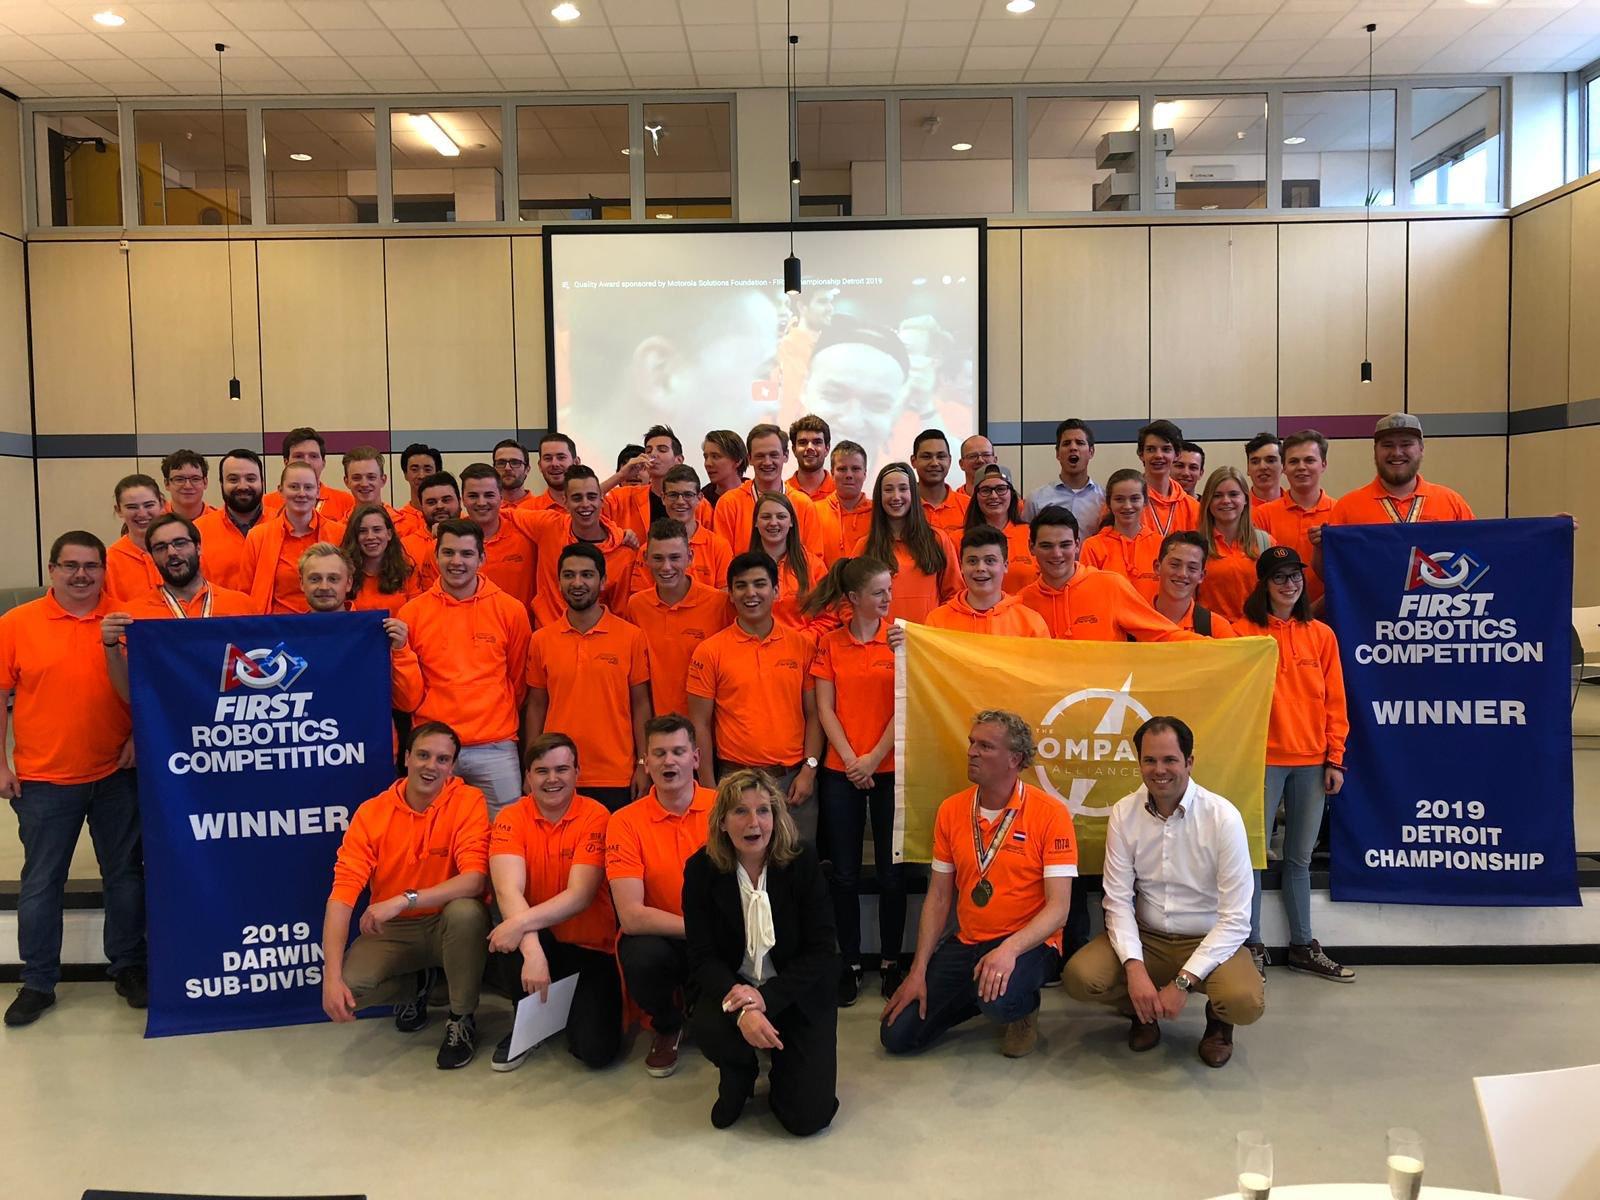 Wereldkampioen robot bouwen komt uit Nederland - TKI Dinalog